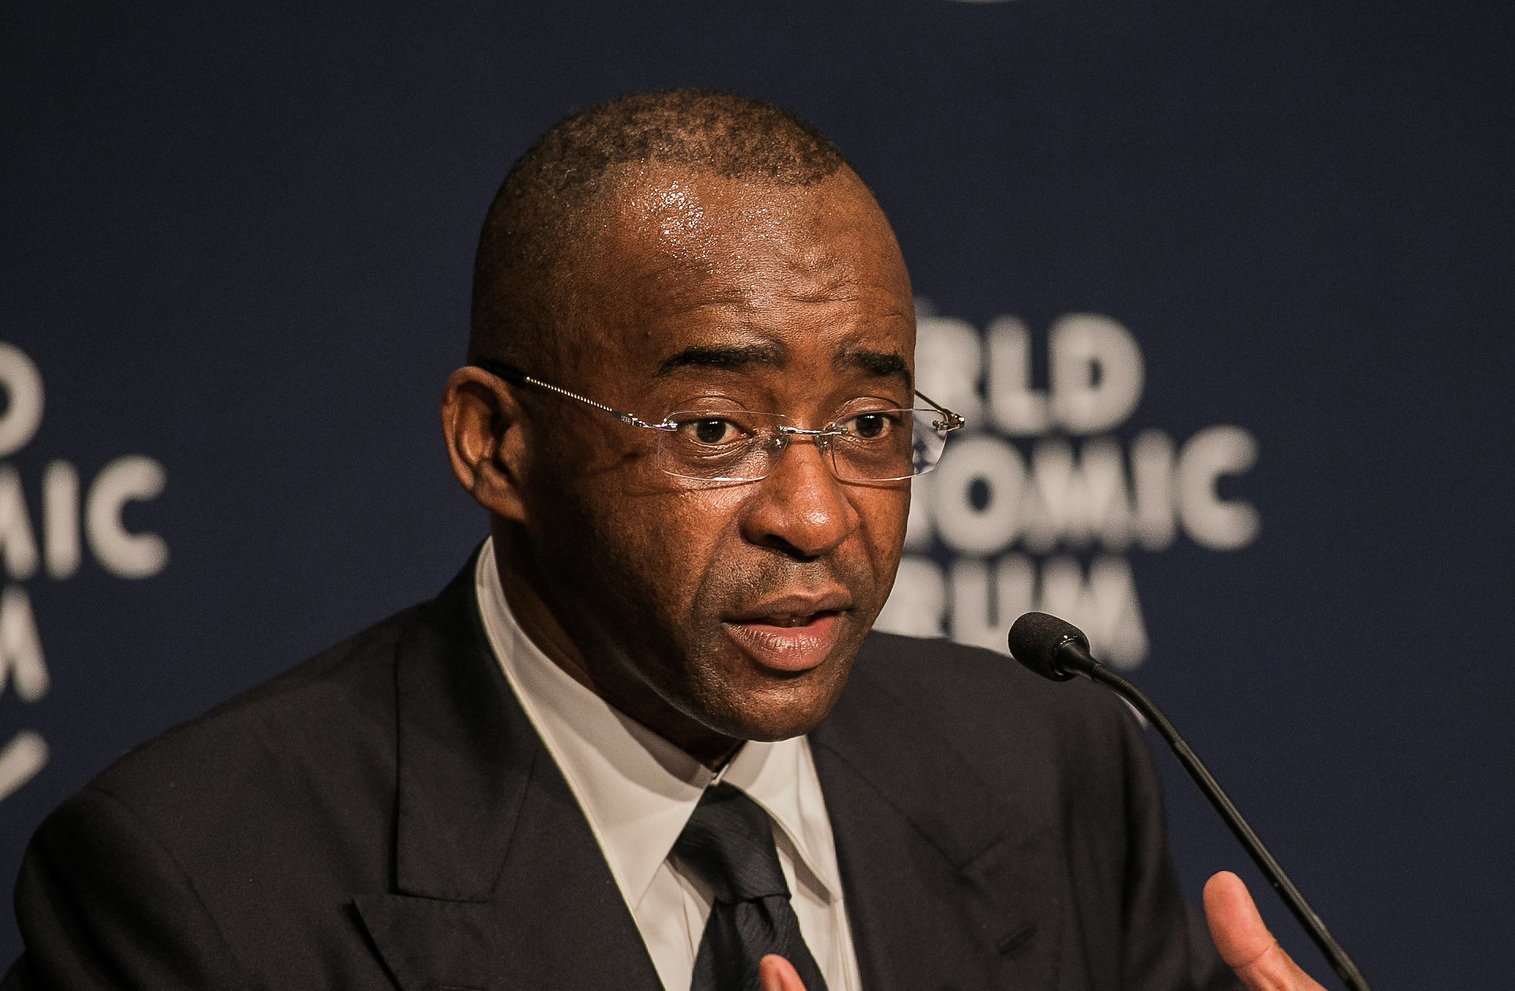 Mr. Strive Masiyiwa at the World Economic Forum on Africa 2013. Photo: World Economic Forum / Benedikt von Loebell